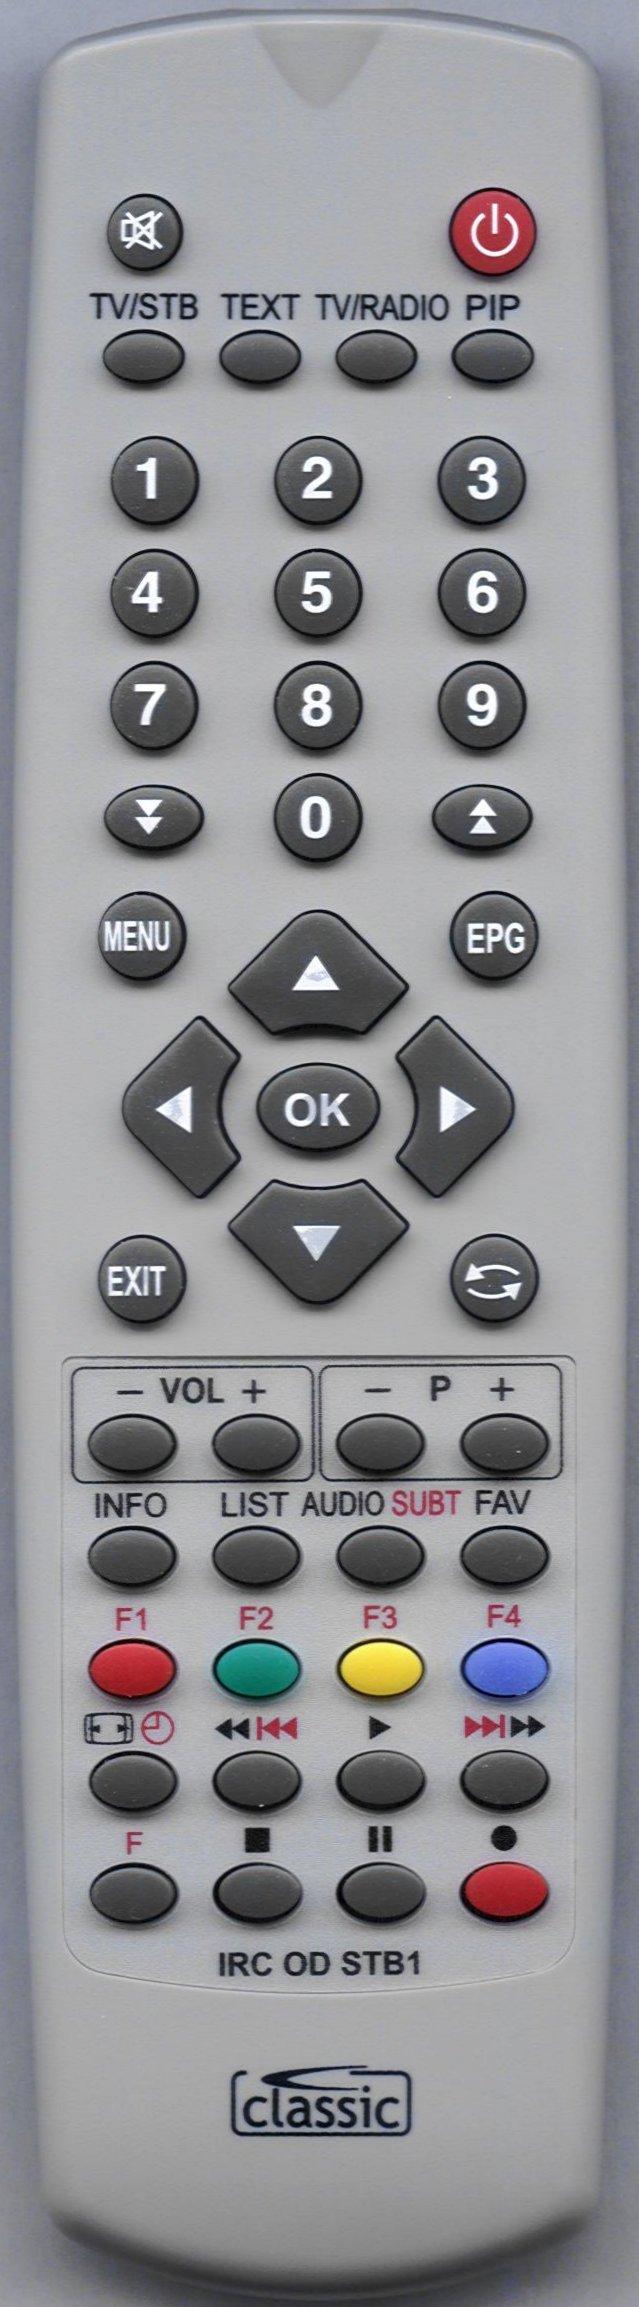 Topfield TF 4000PVR VERS.1 Remote Control